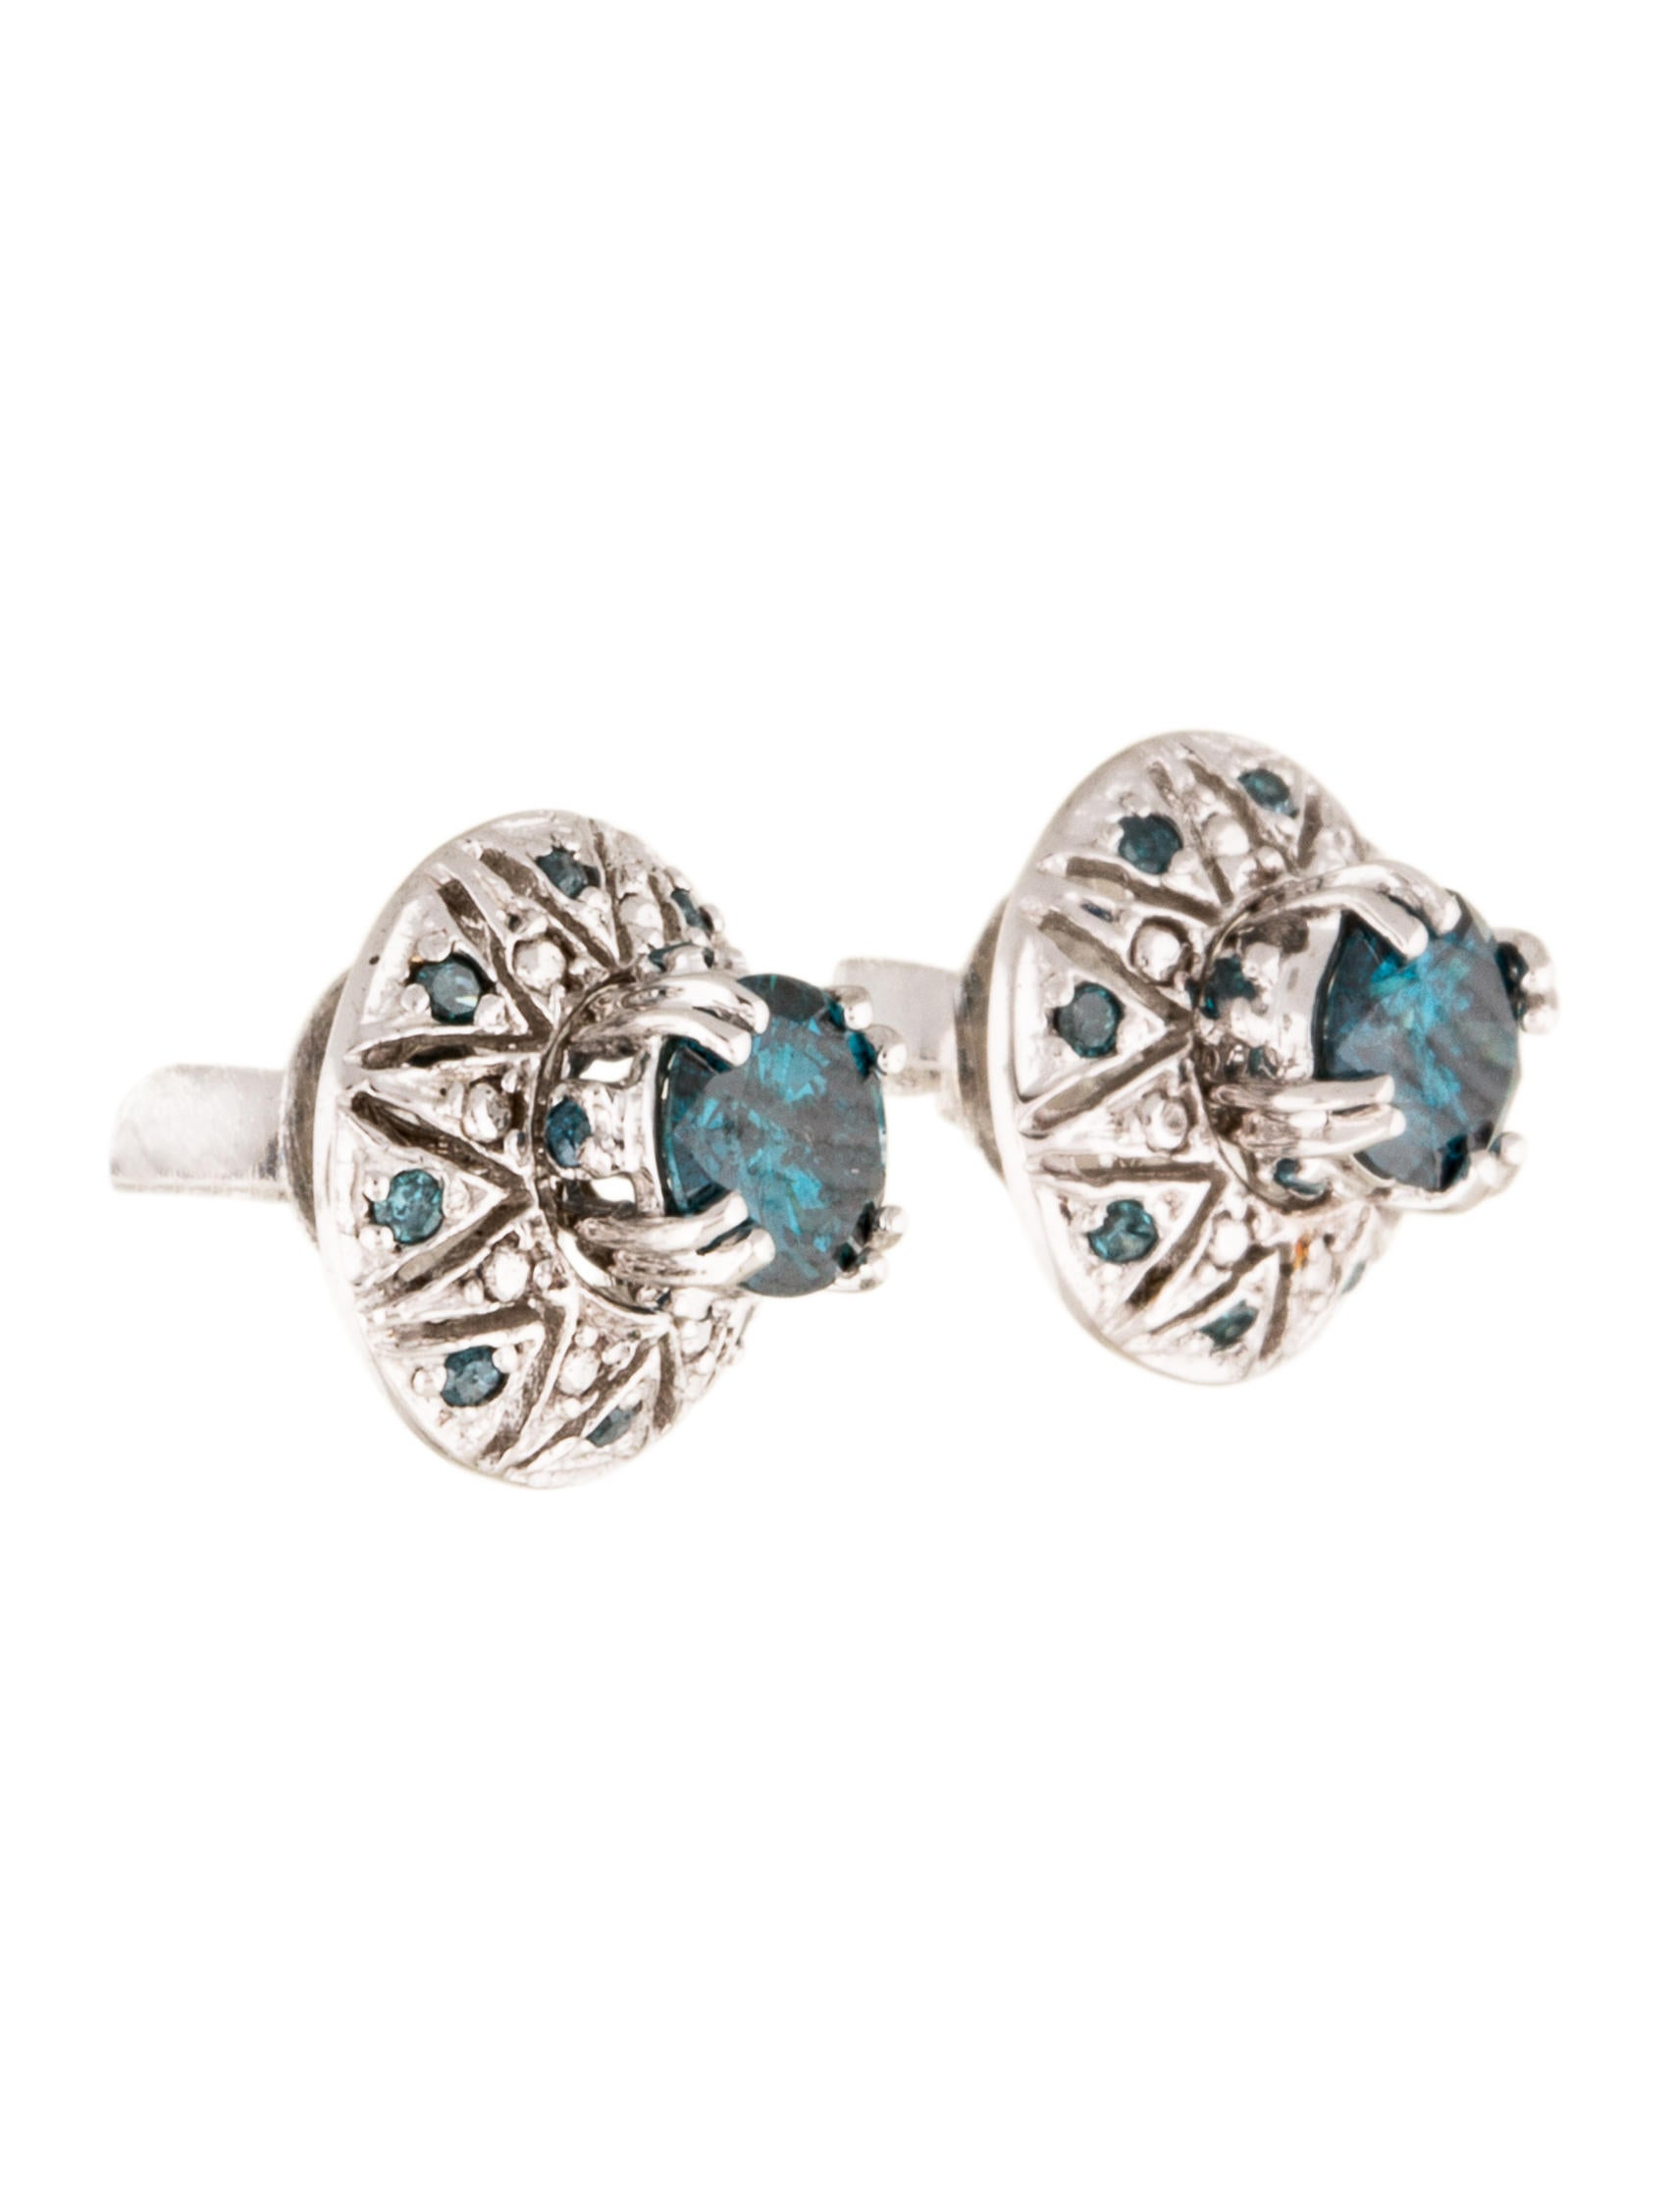 14k blue diamond stud earrings earrings earri35146. Black Bedroom Furniture Sets. Home Design Ideas